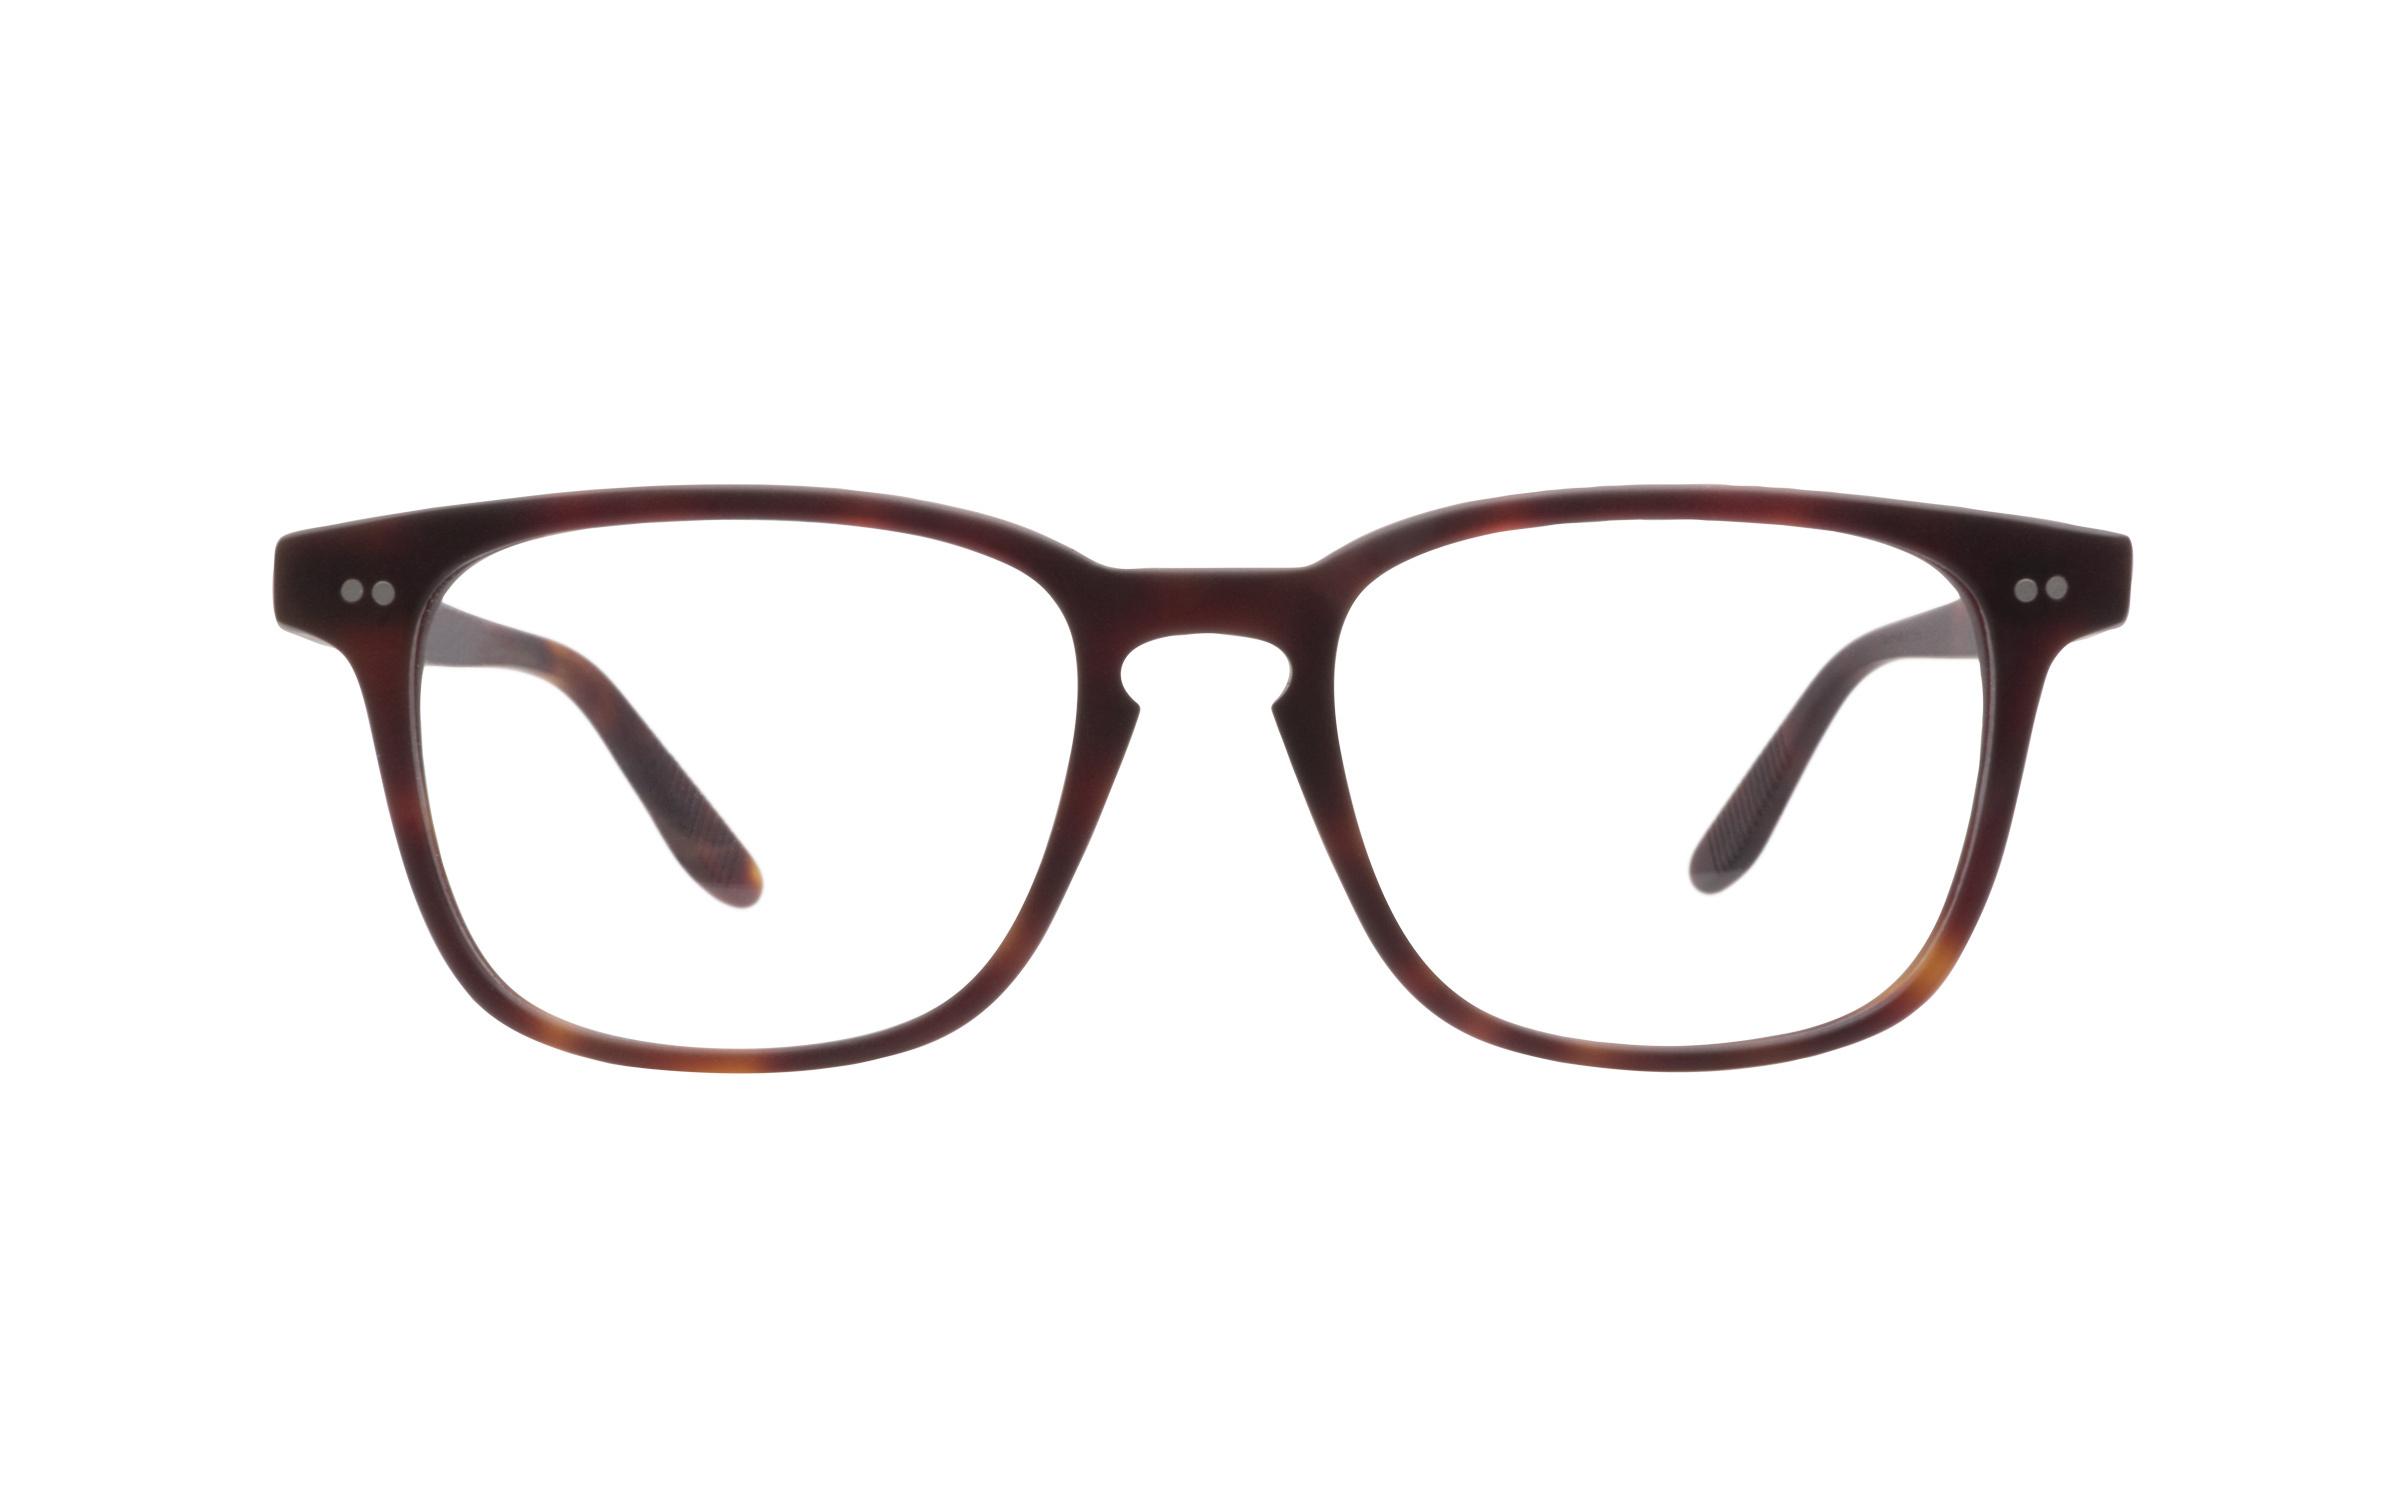 Joseph_Marc_Mens_Glasses_Vintage_Tortoise_Online_Coastal